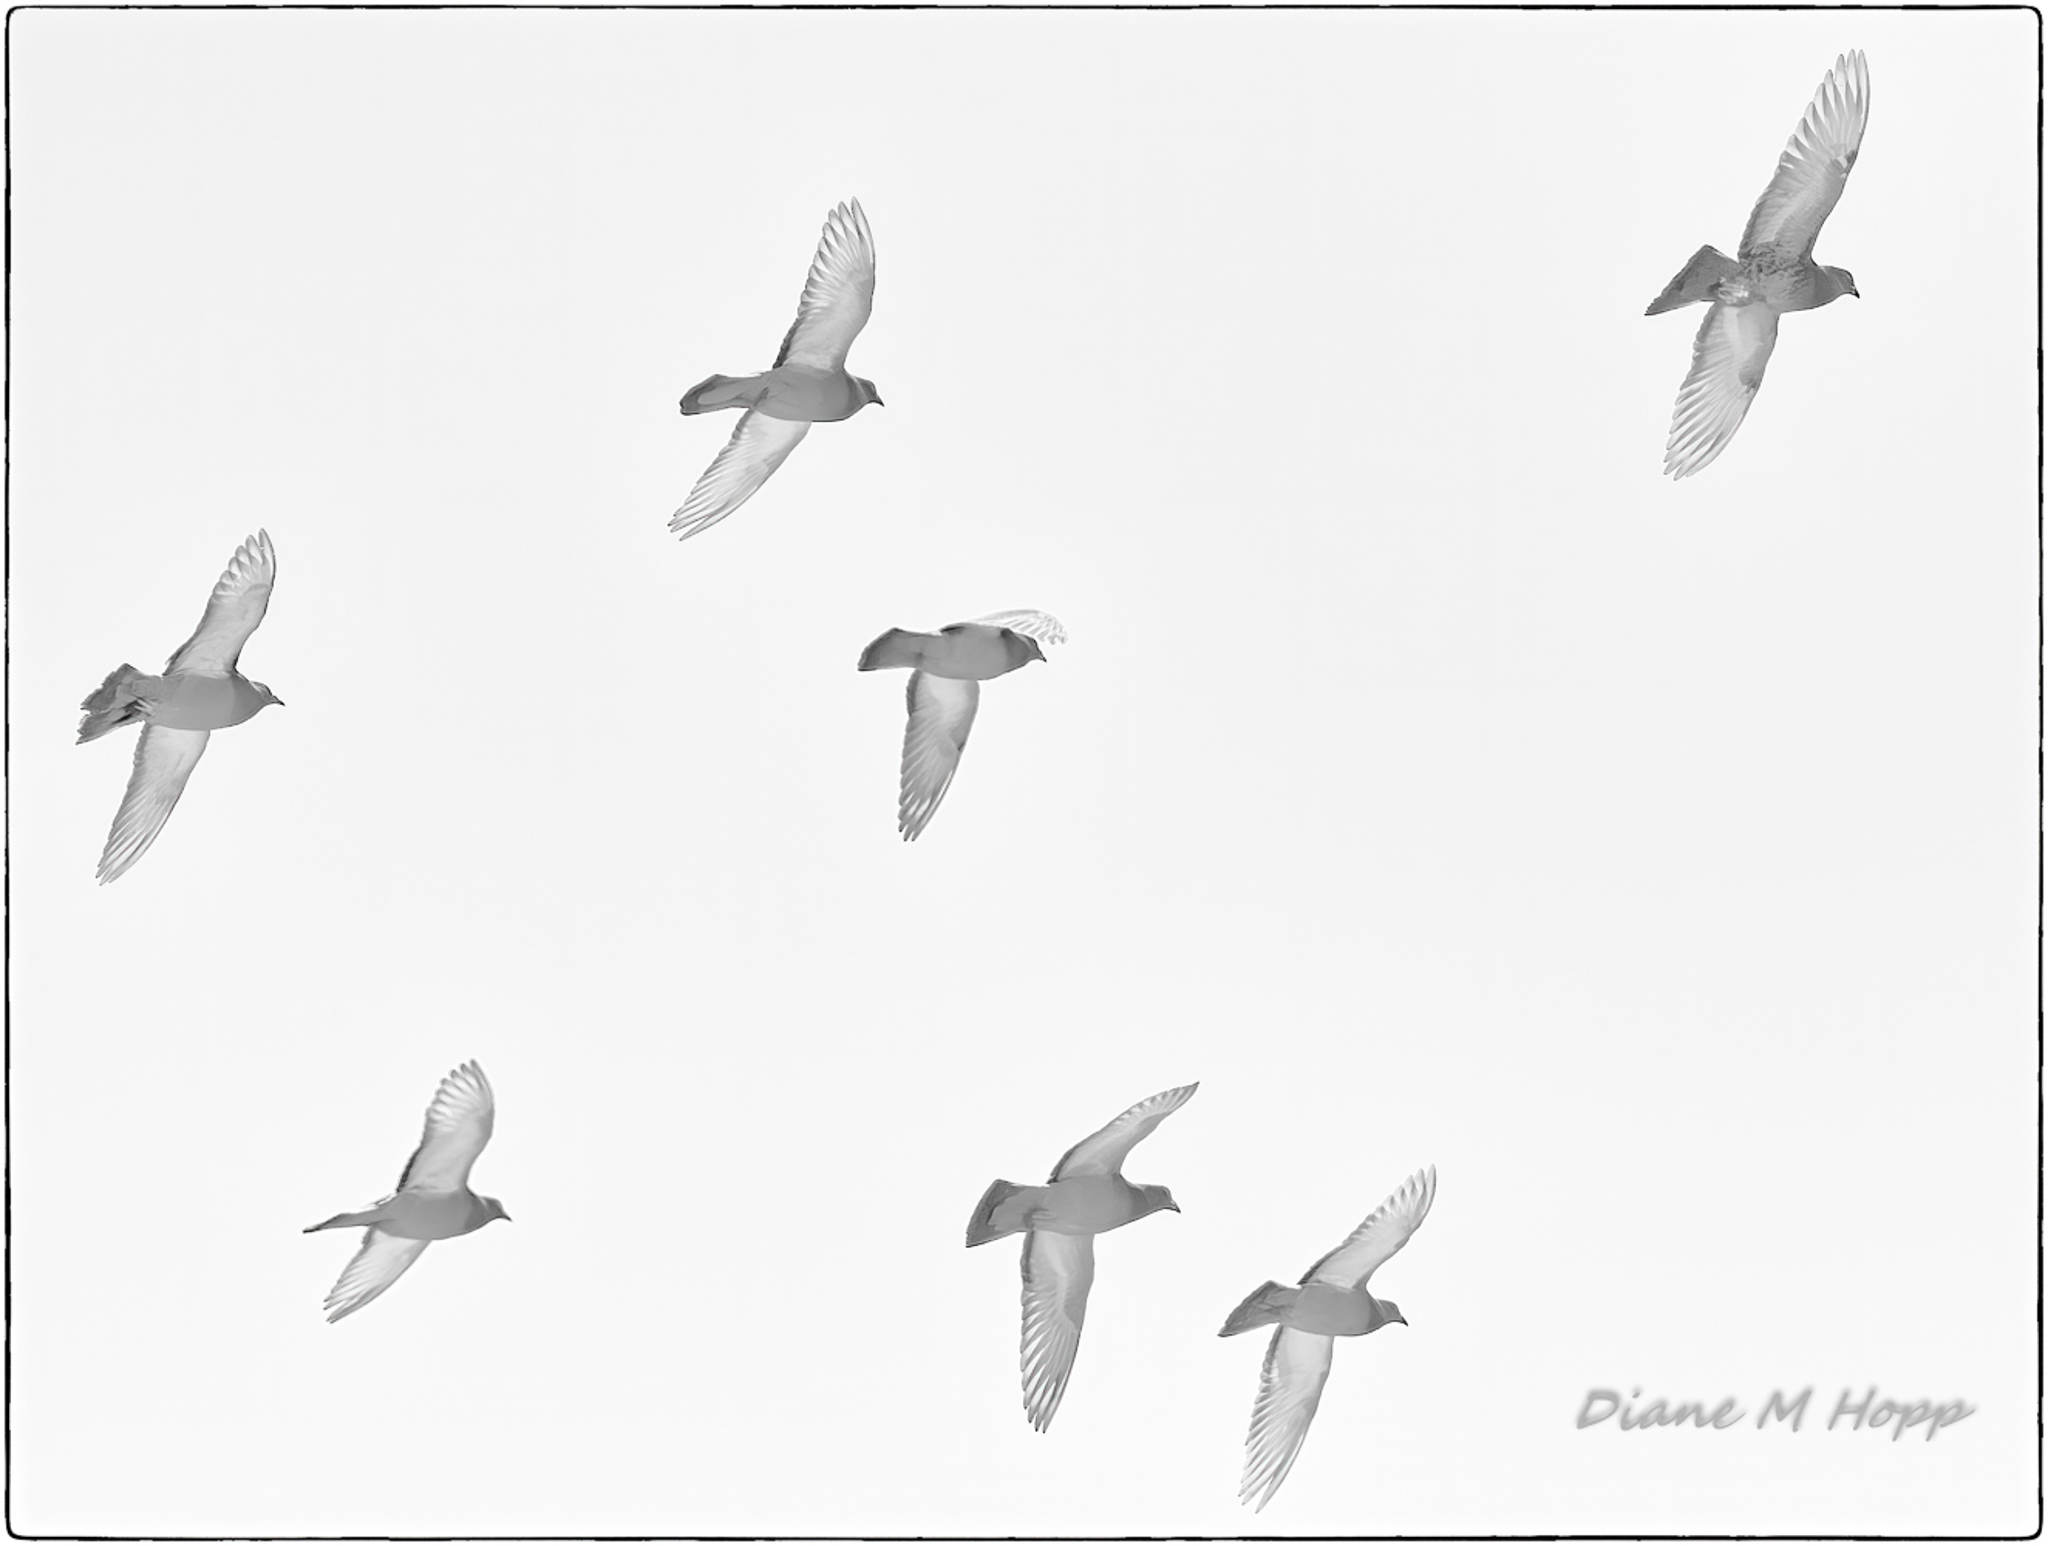 Diane Hopp - Just Pigeons